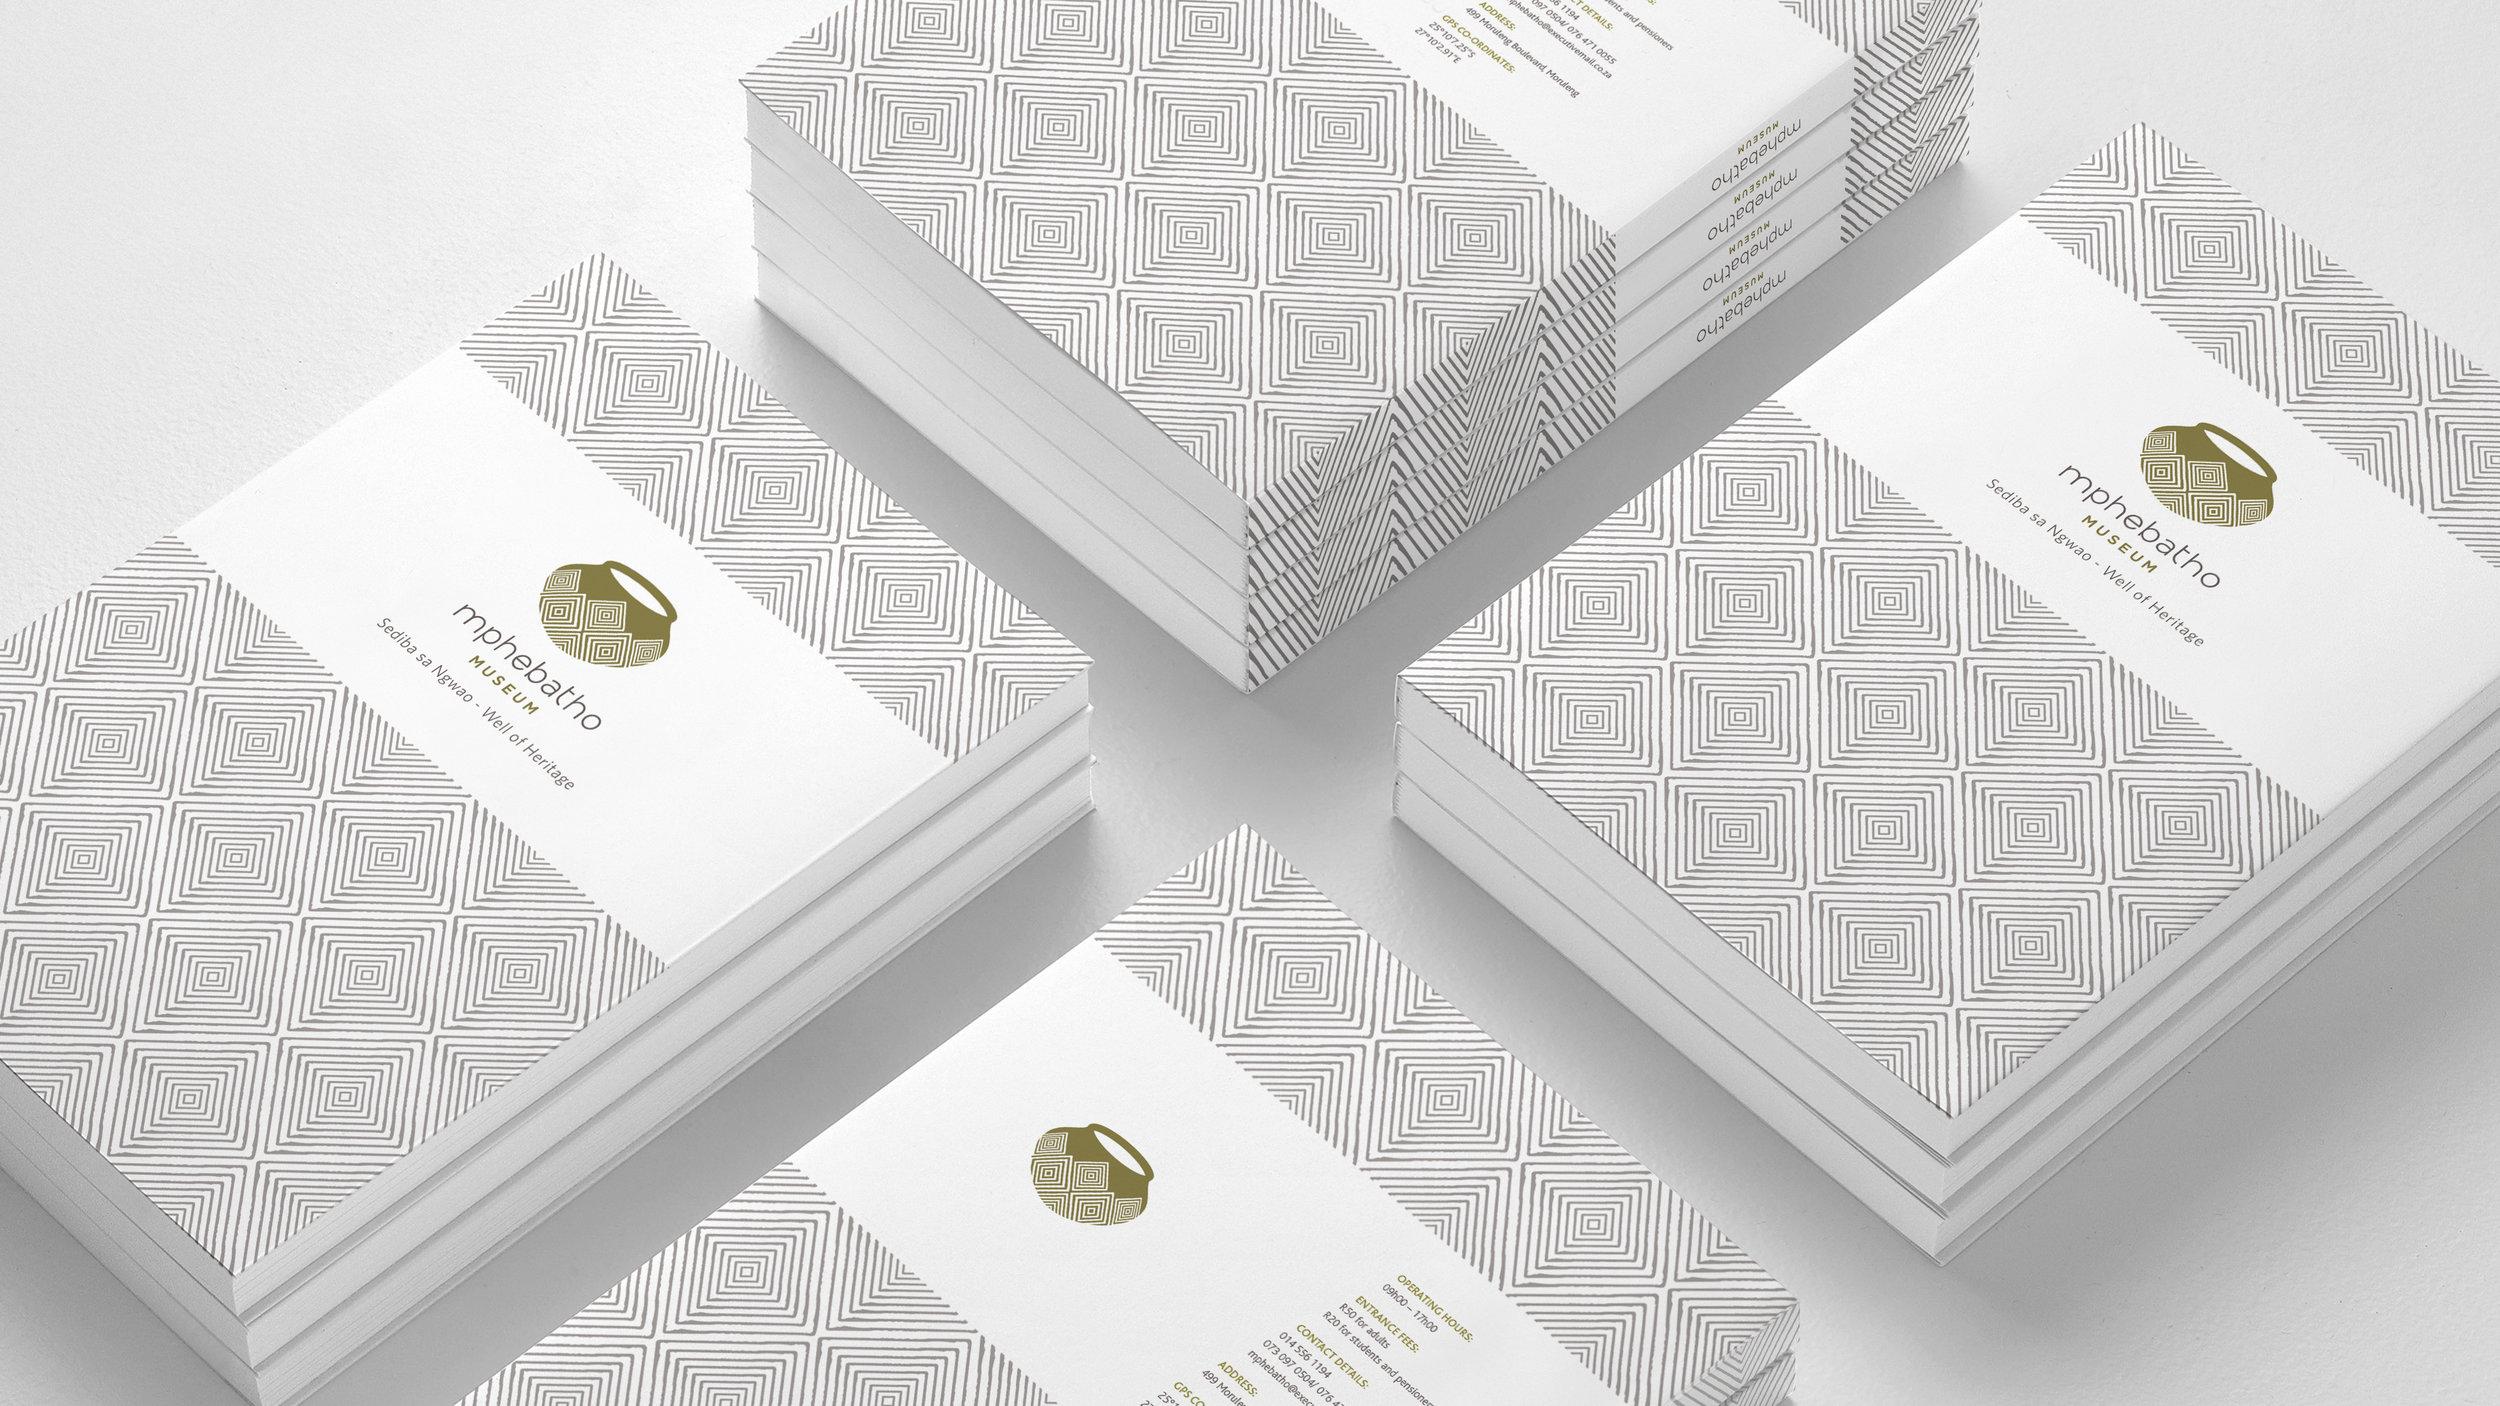 Brand_republica_mphebatho_museum_brochure_design_covers.jpg